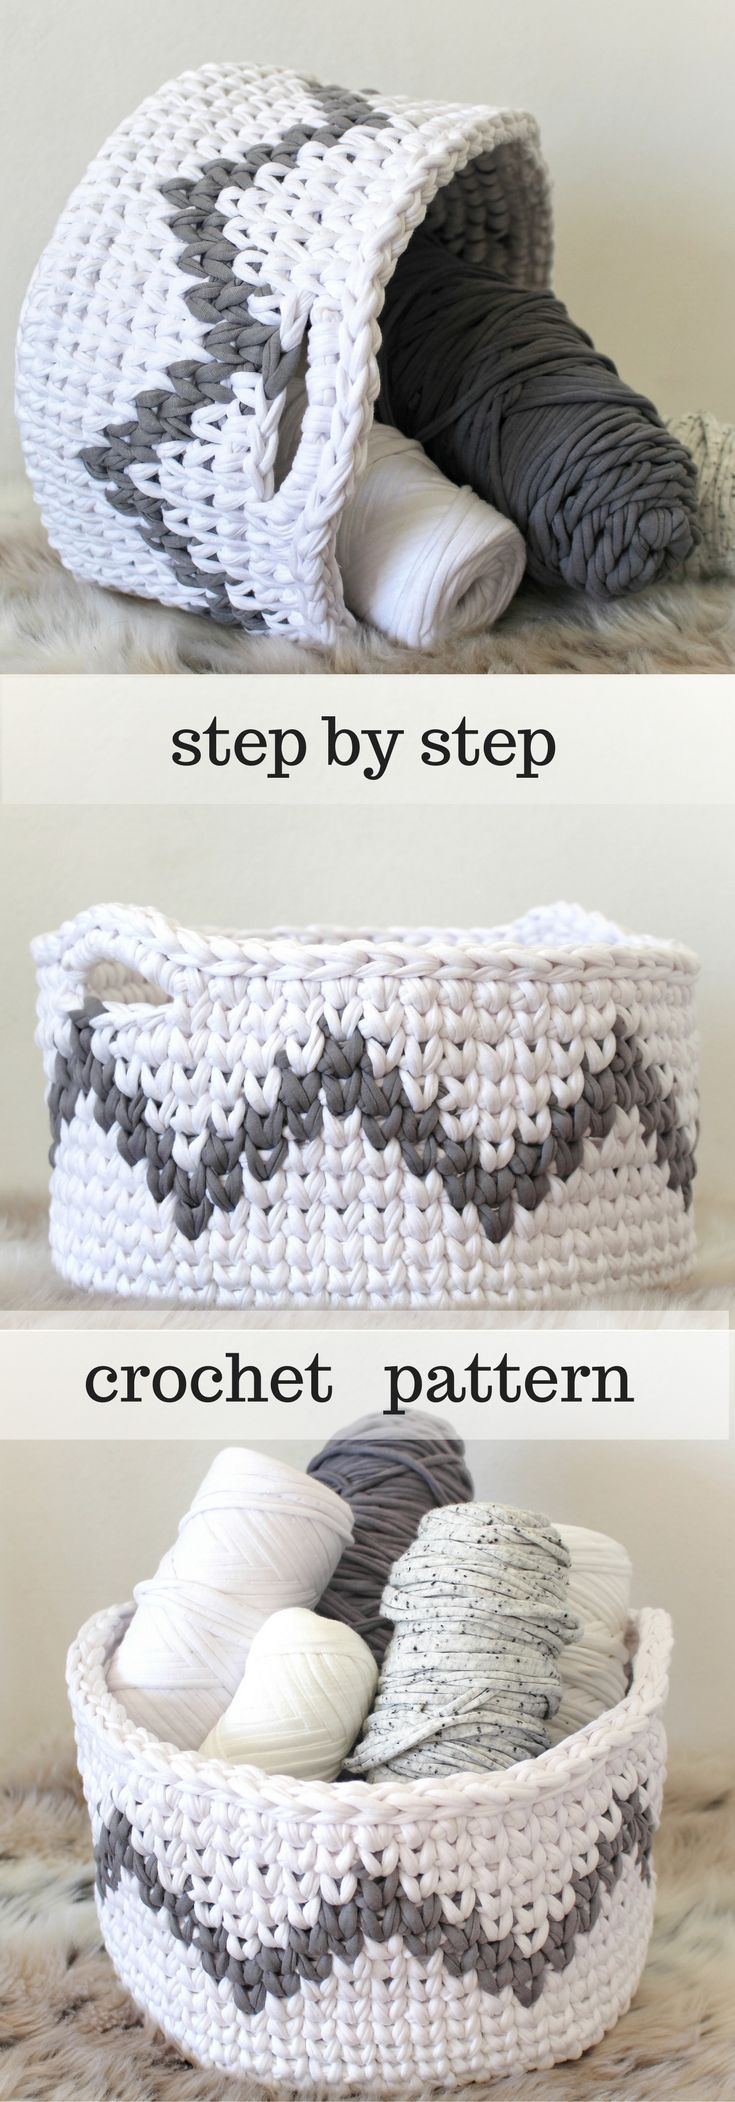 Crochet Basket Pattern for Chevron Home Decor! Zig Zag baskets are ...